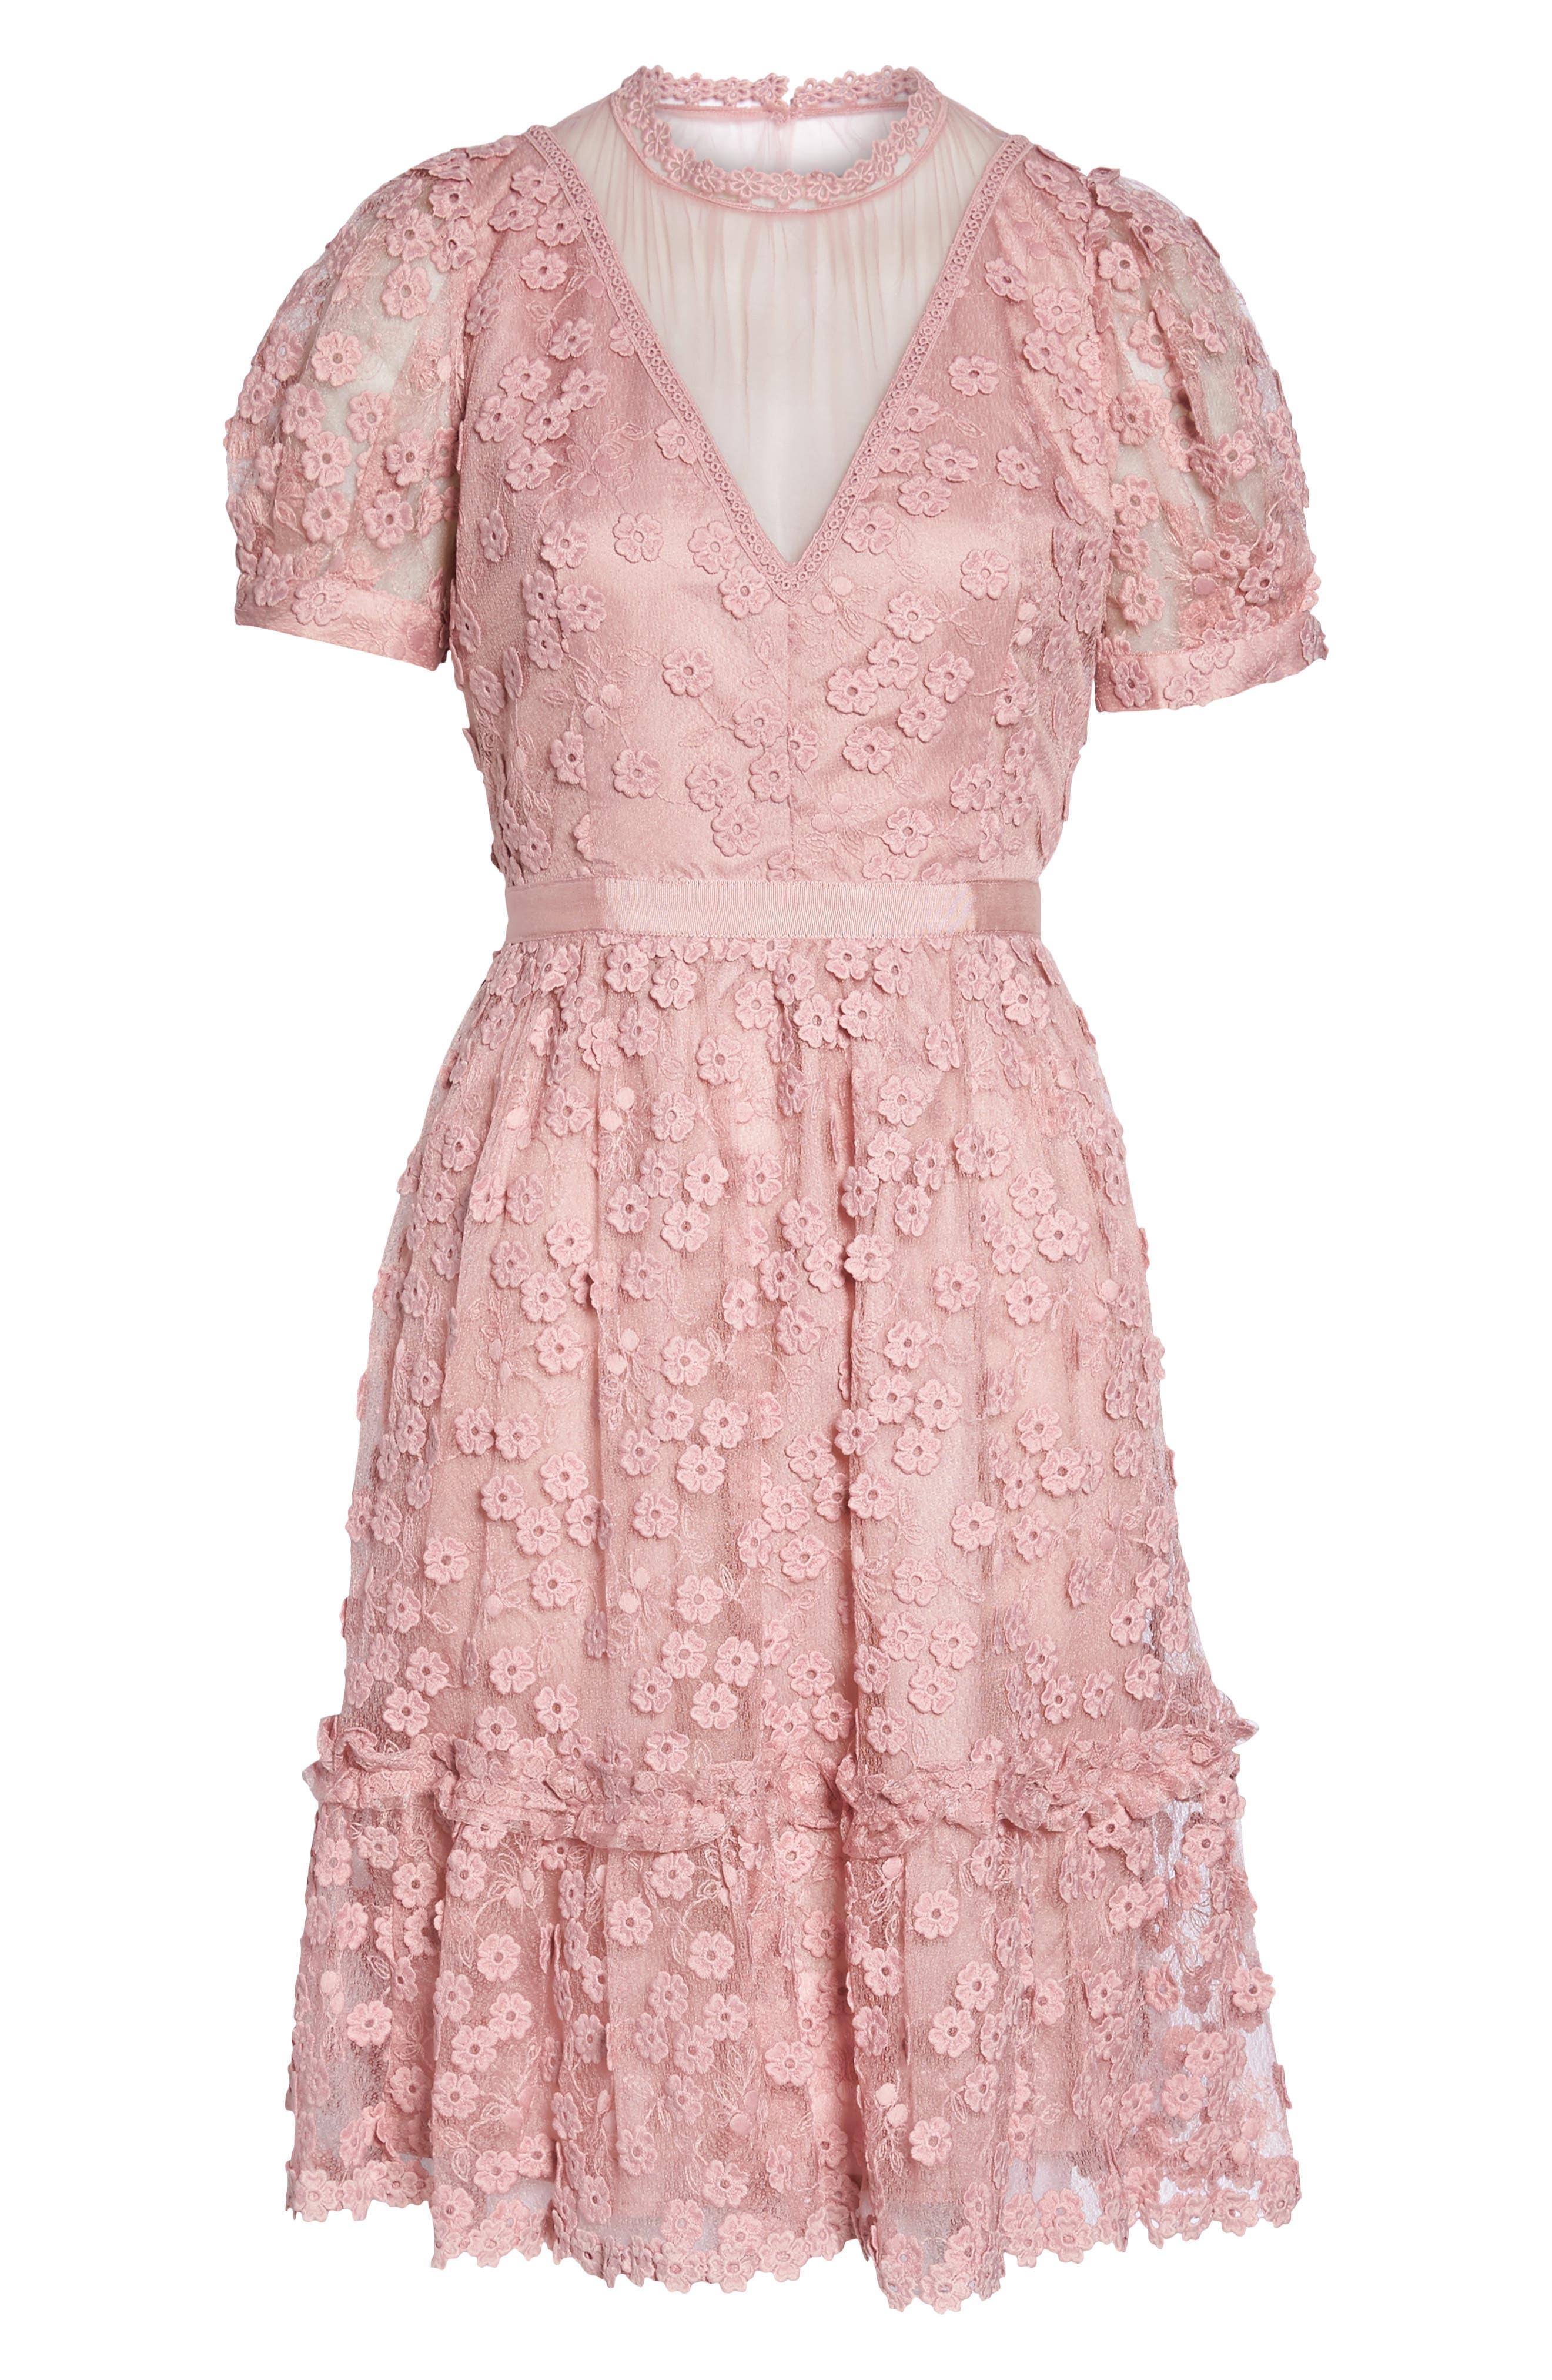 Caballo Lace Dress,                             Alternate thumbnail 7, color,                             655